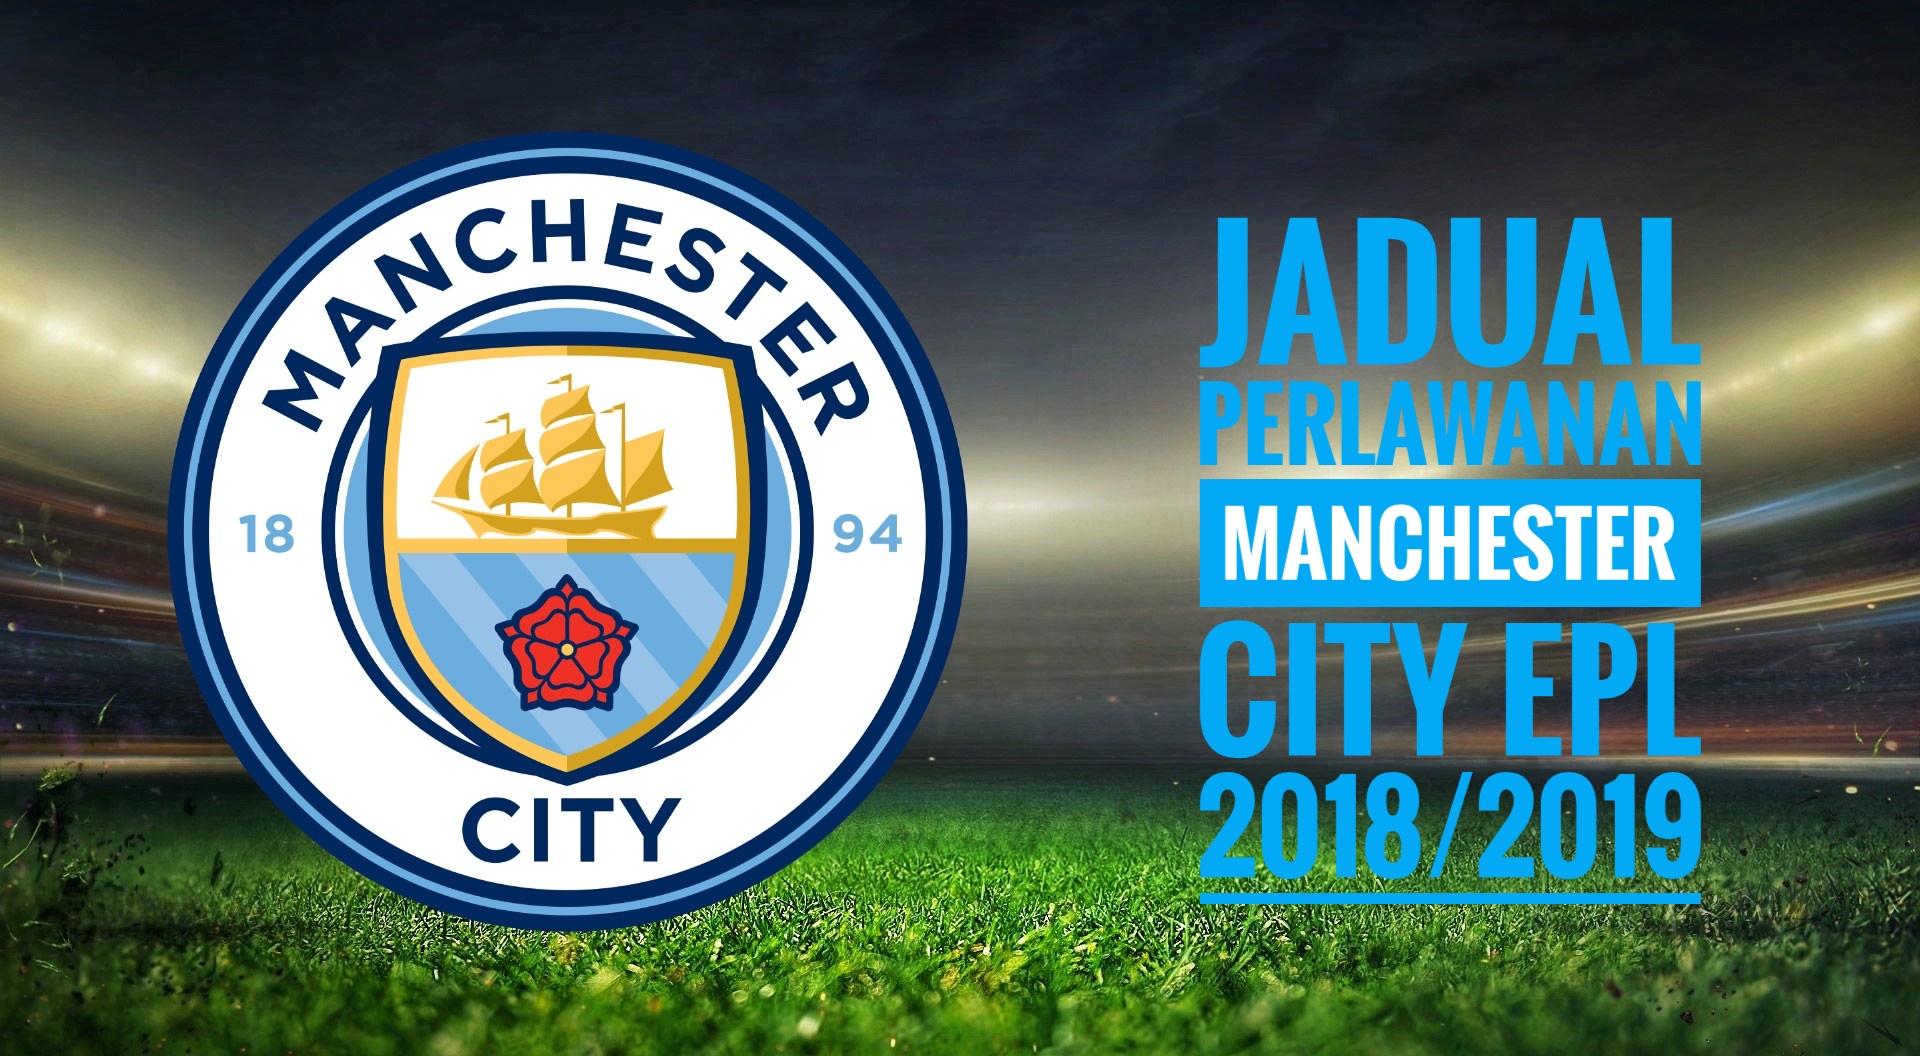 Jadual Perlawanan Manchester City EPL 2018/2019